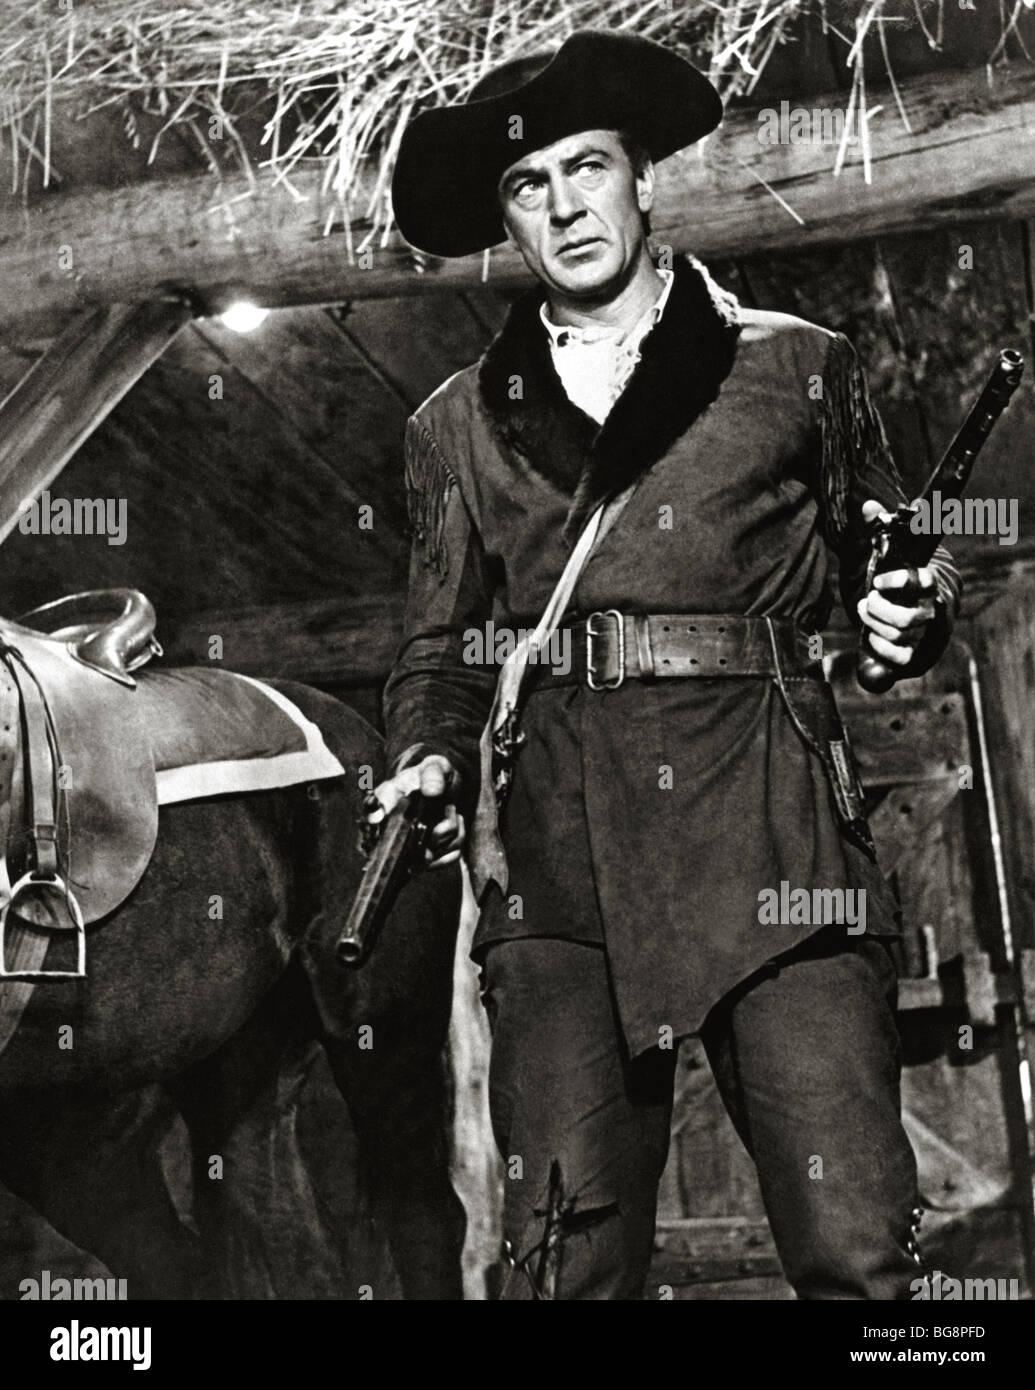 COOPER, Gary (Helena,1901-Hollywood,1961). L'acteur américain. Photo Stock